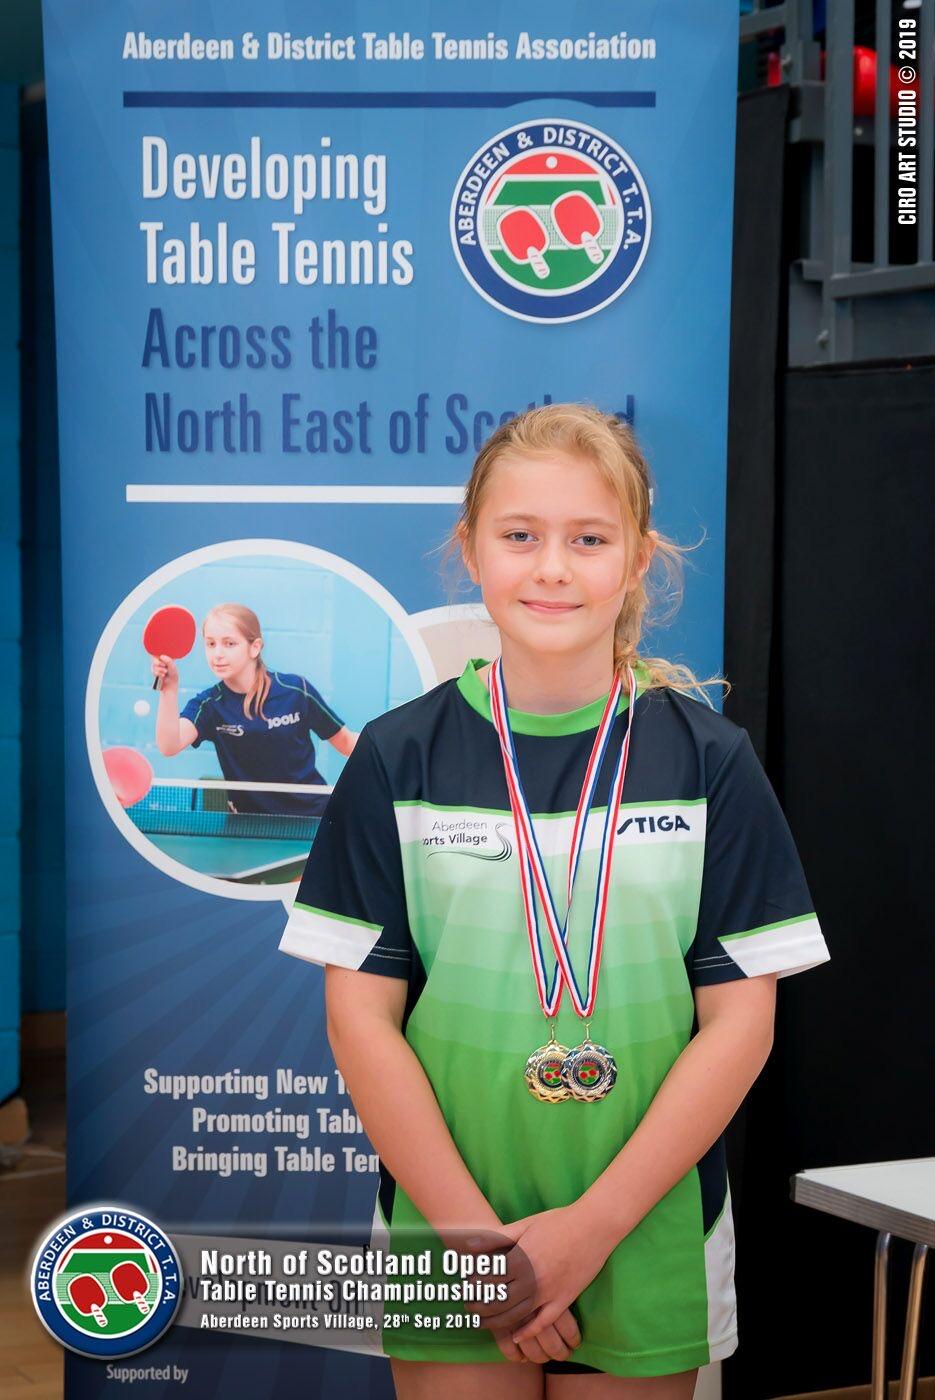 North of Scotland Open